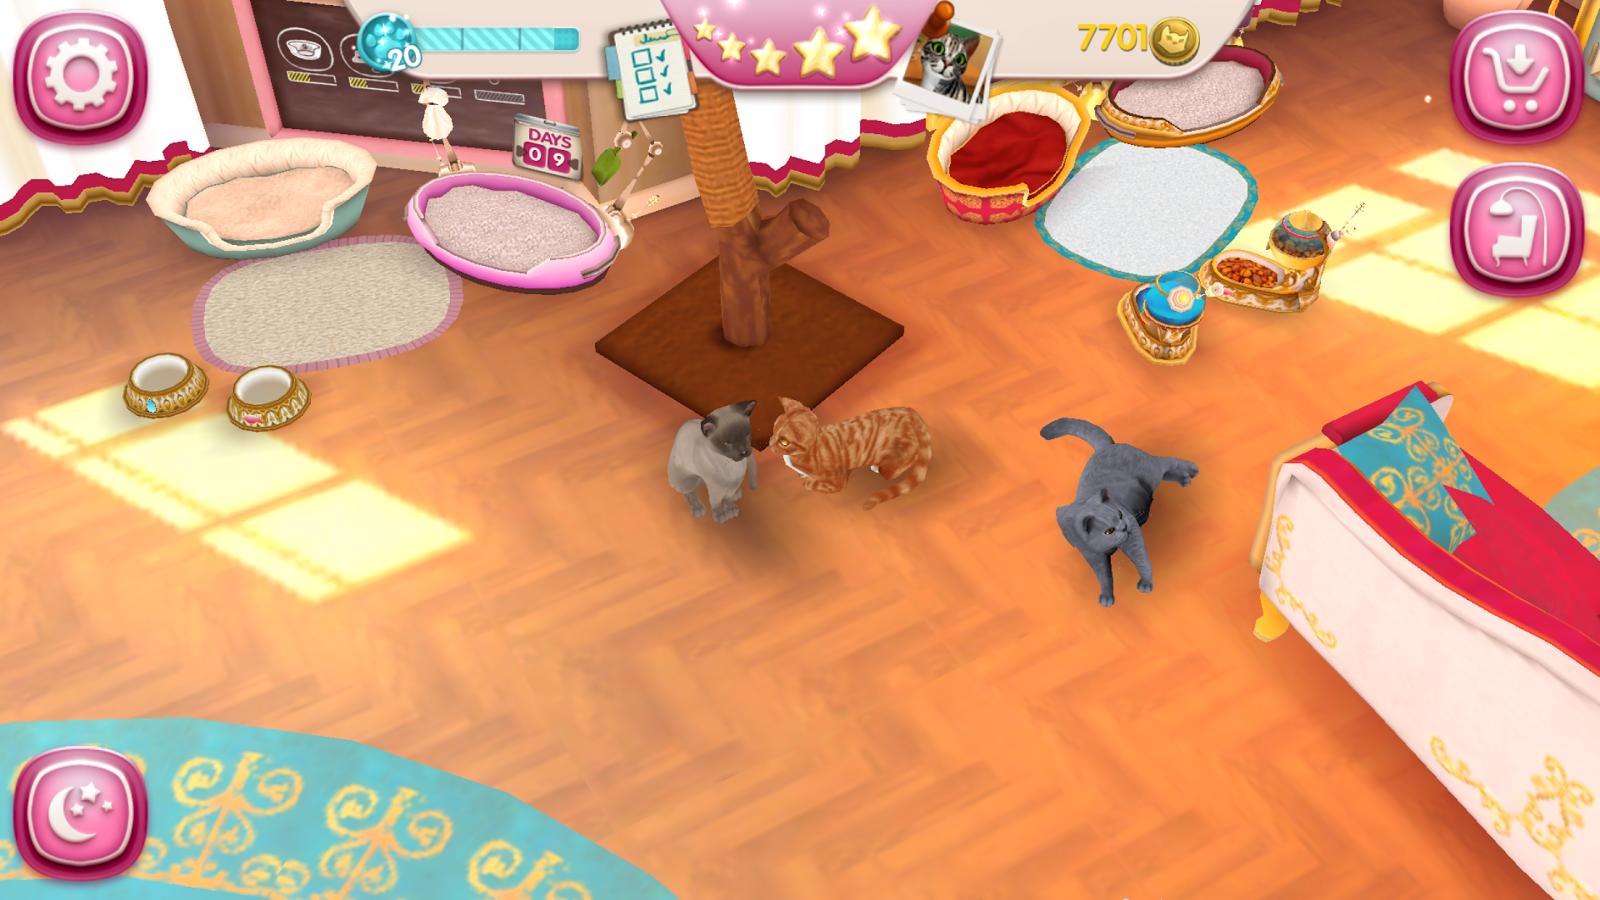 cathotel-hotel-para-gatos-3